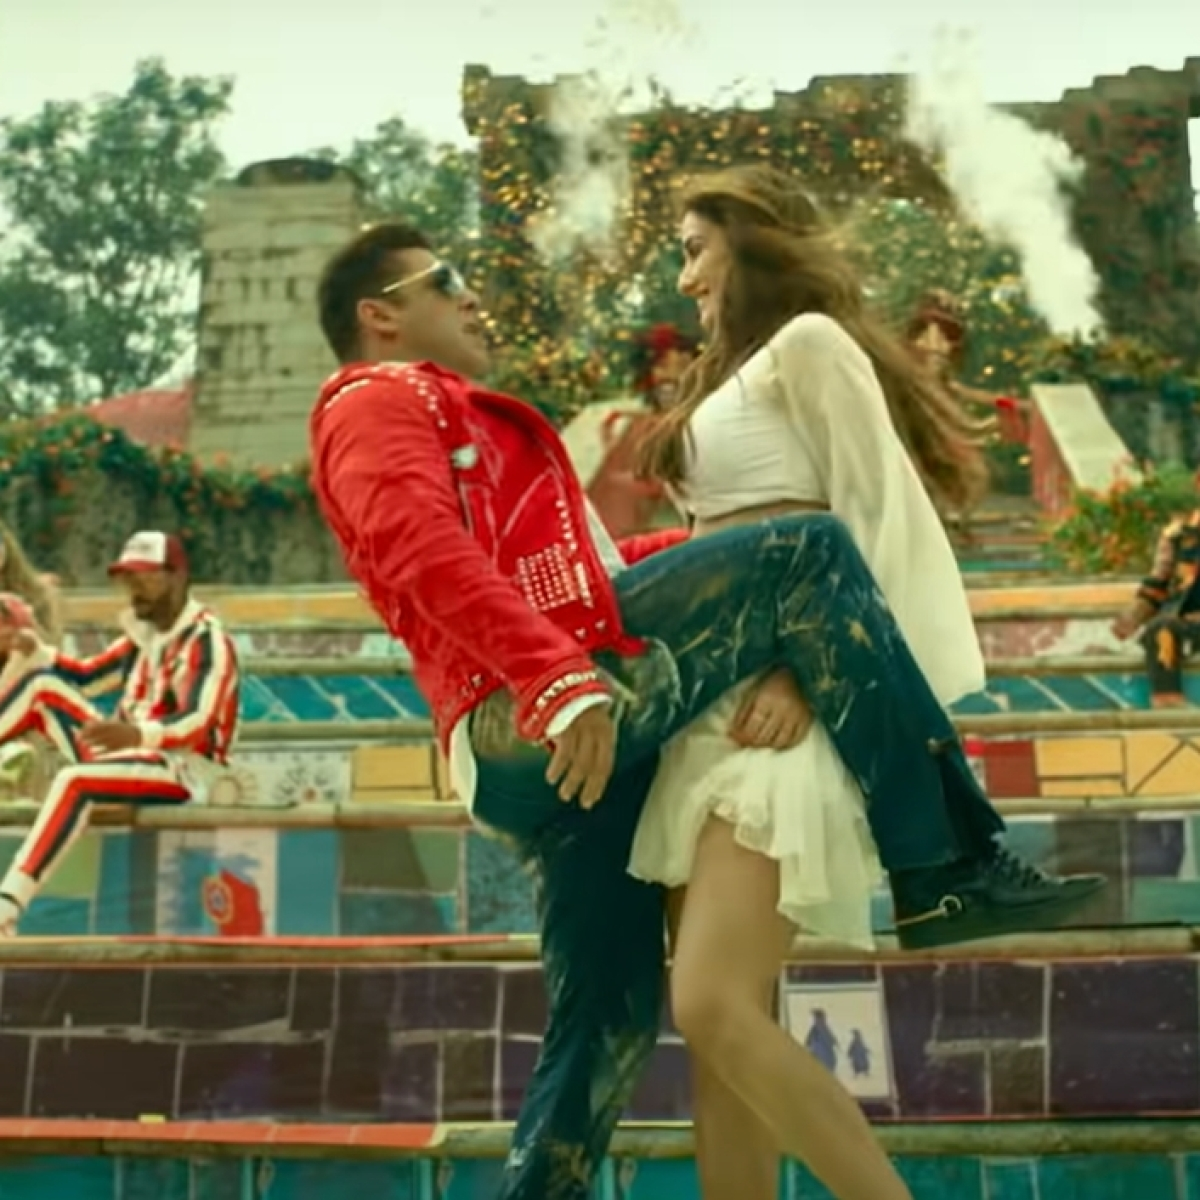 Watch: Salman Khan saves Disha Patani from falling in 'Zoom Zoom' BTS clip during 'Radhe' shoot